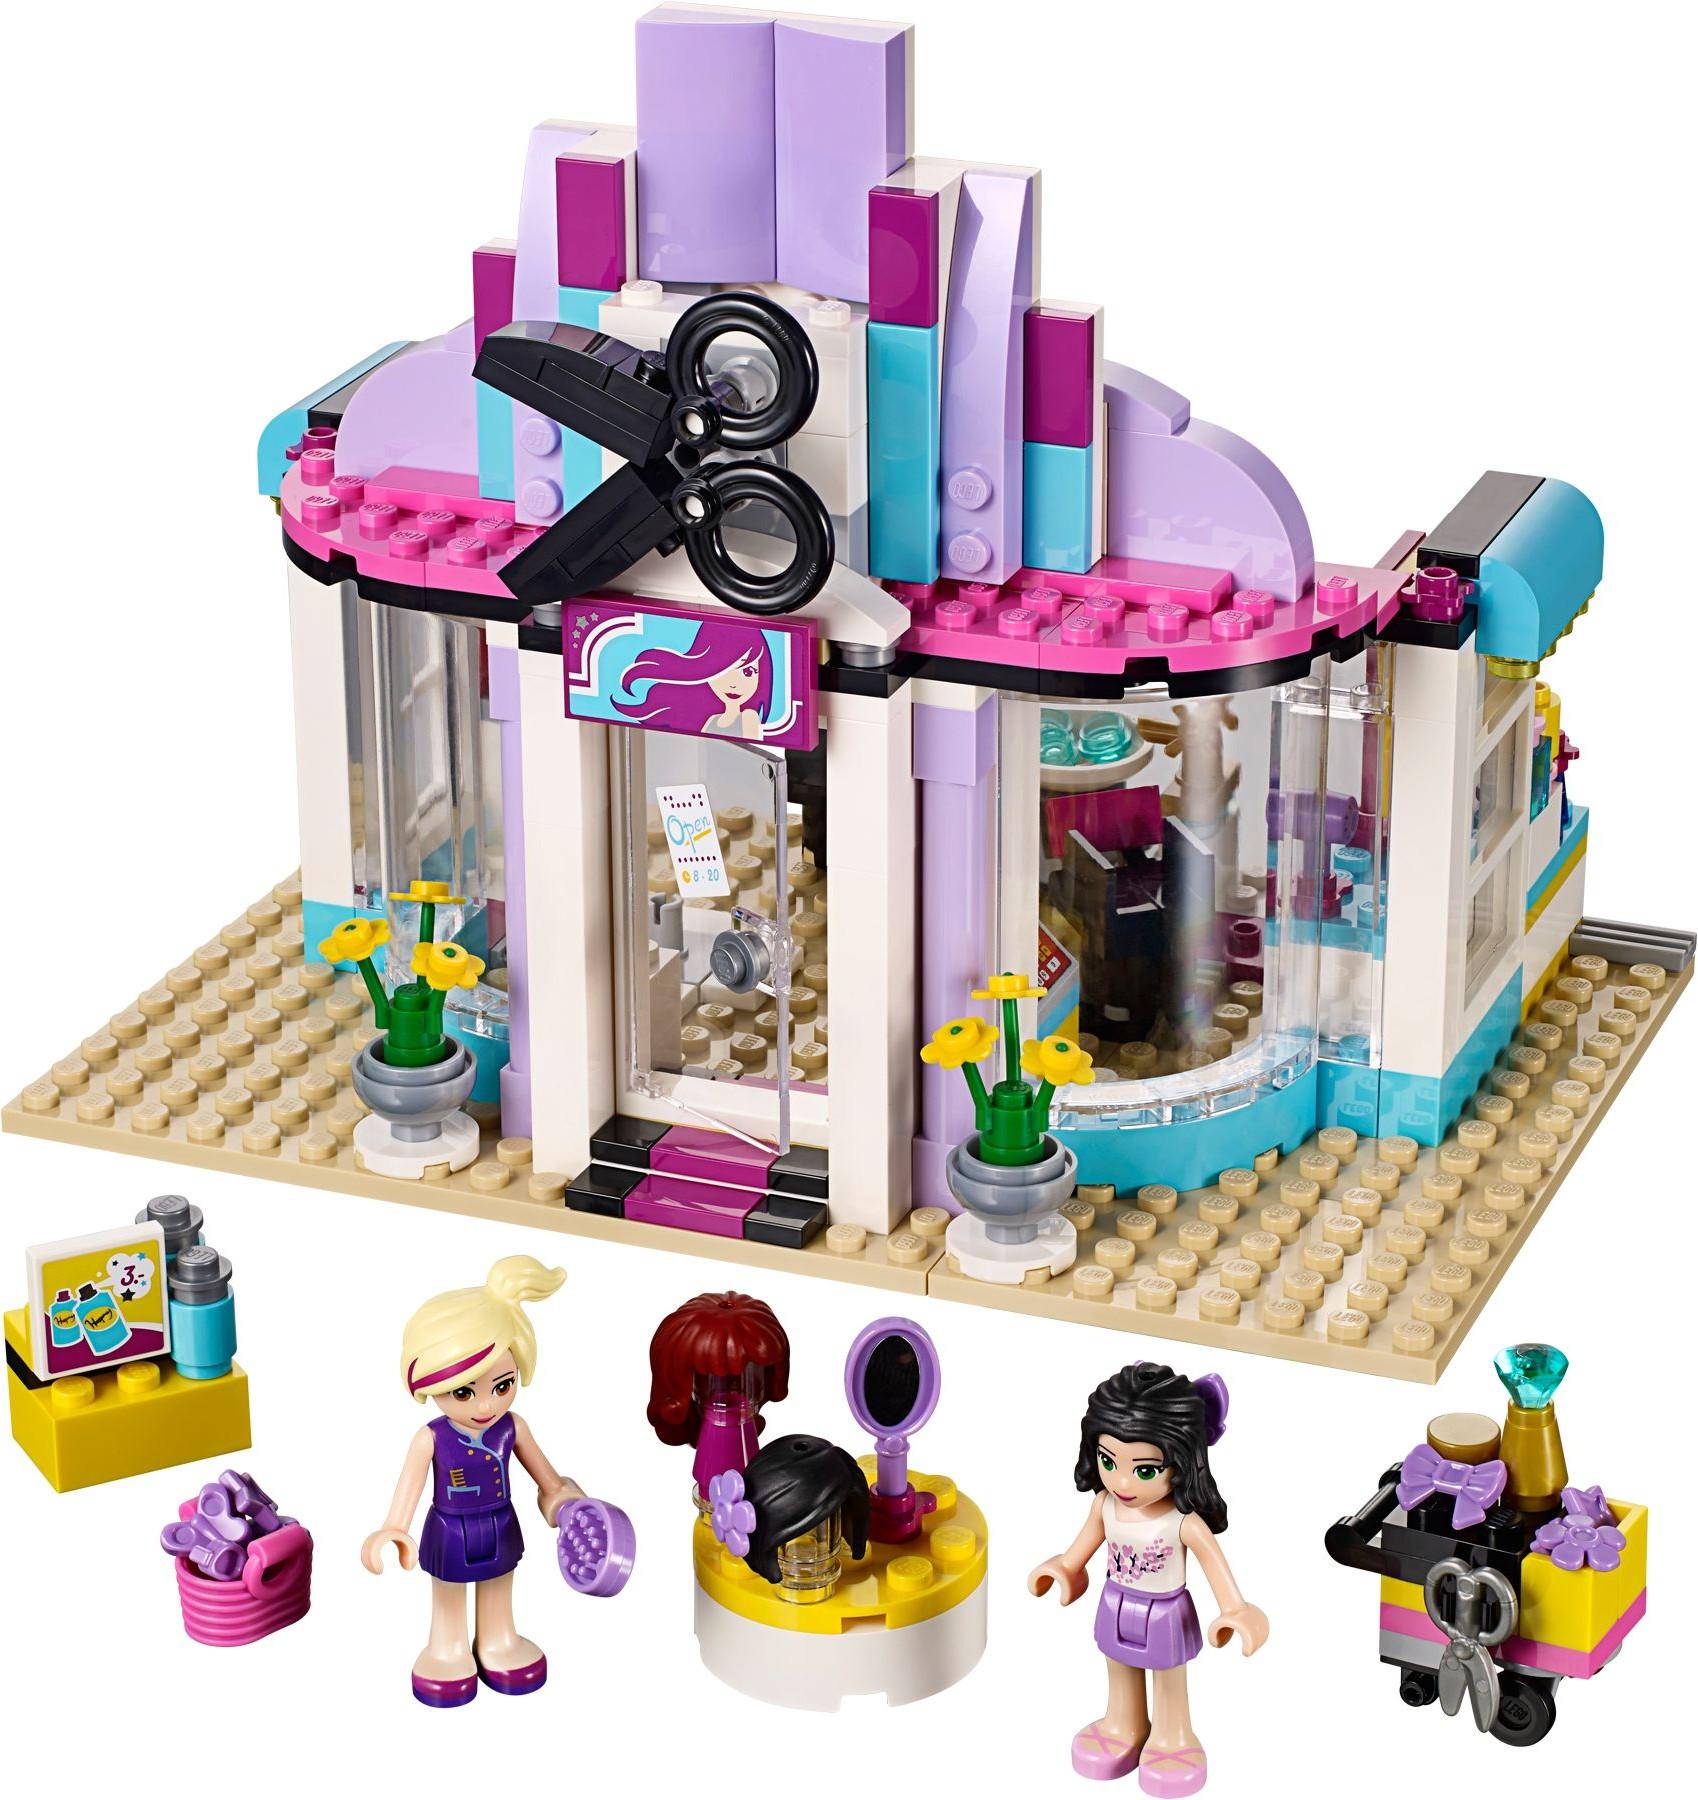 Heartlake Hair Salon (41093)   LEGO Friends Wiki   Fandom